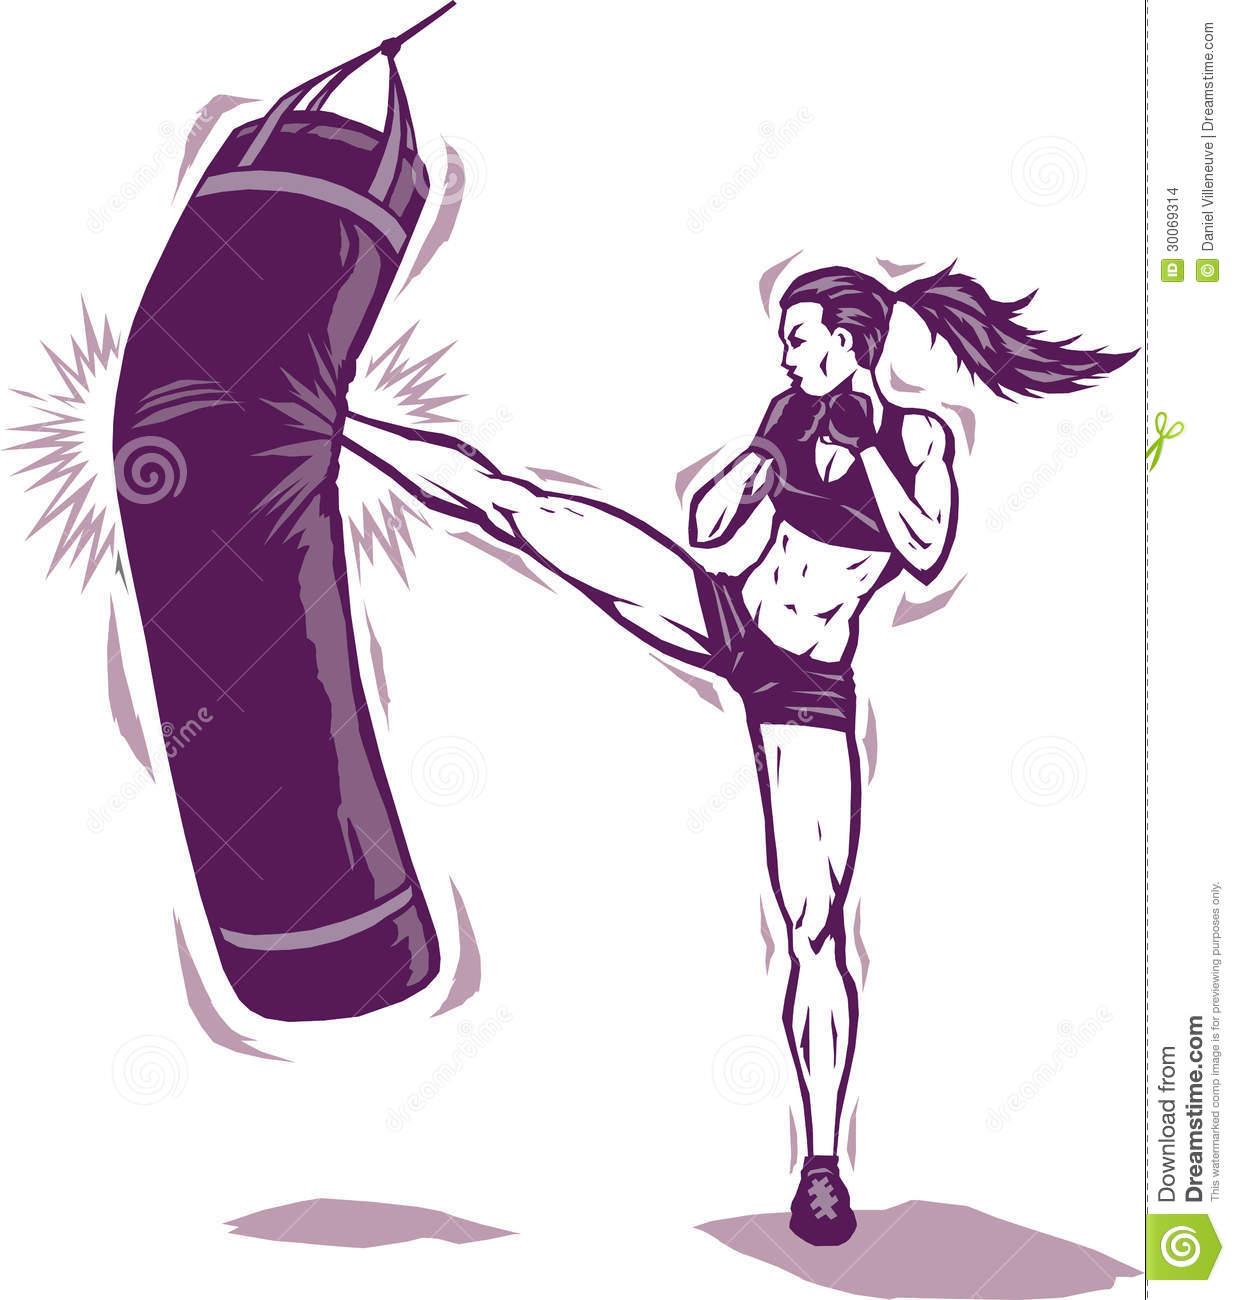 Kickboxing Pictures Clip Art.